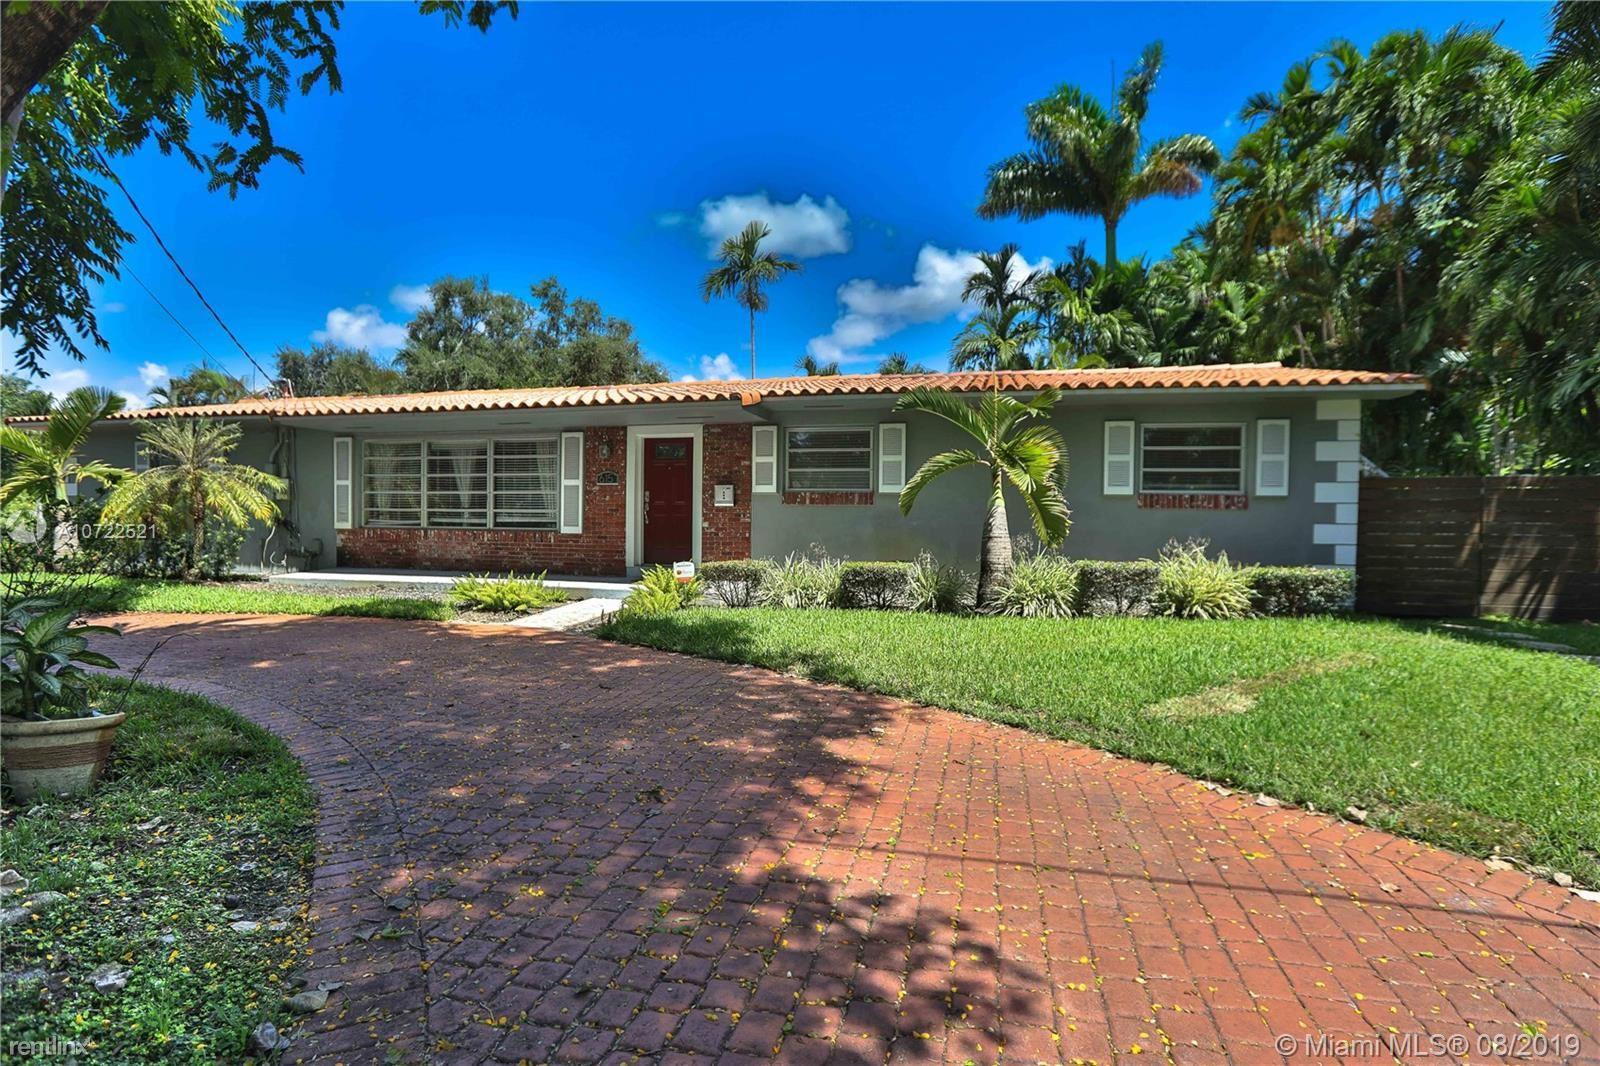 615 NE 115th St, Biscayne Park, FL - $3,700